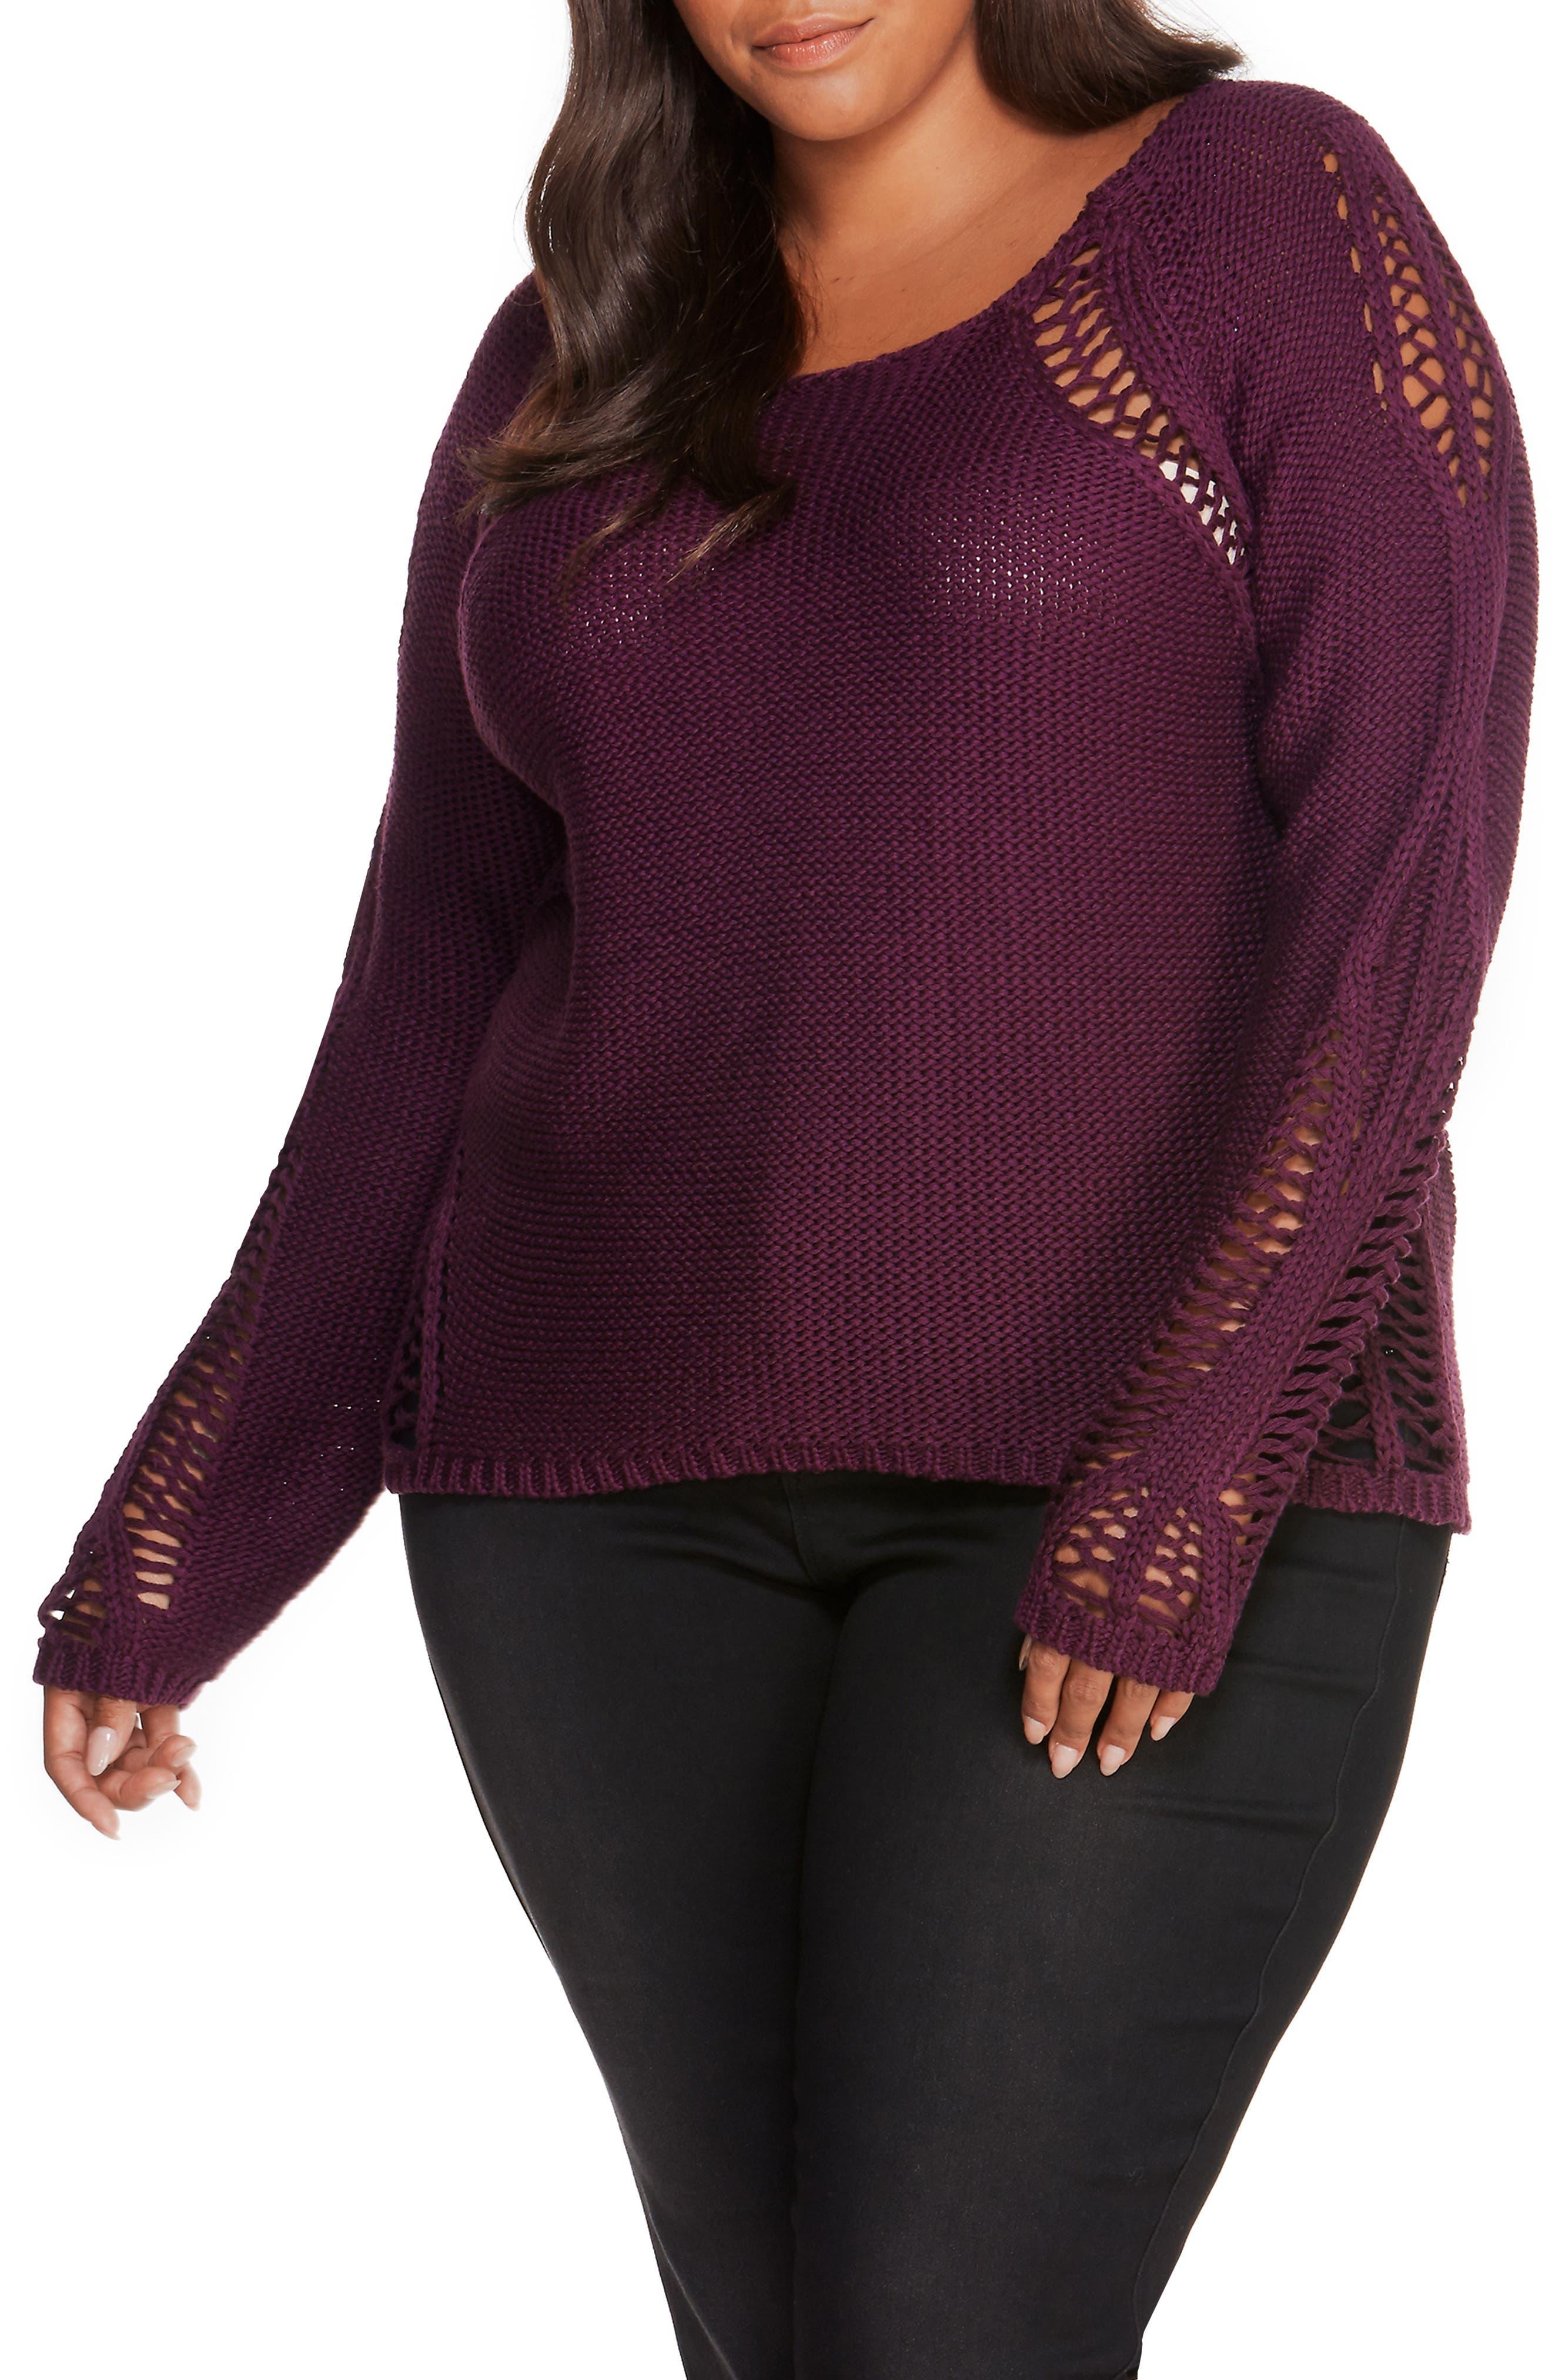 Main Image - Rebel Wilson x Angels Open Stitch Sweater (Plus Size)